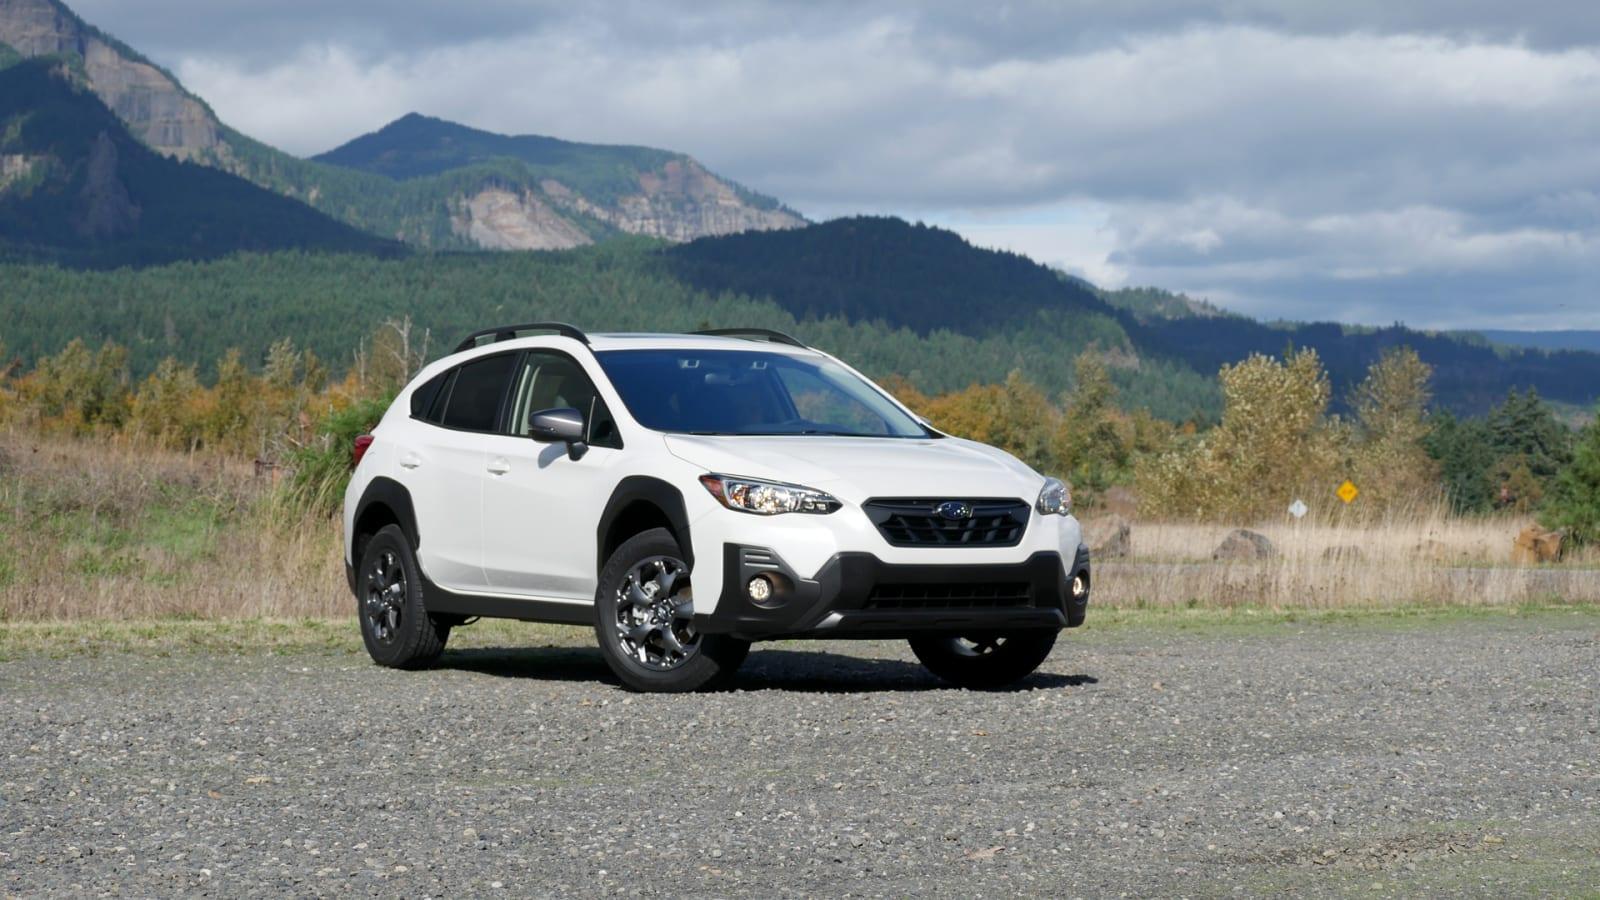 2021 Subaru Crosstrek Sport front in white